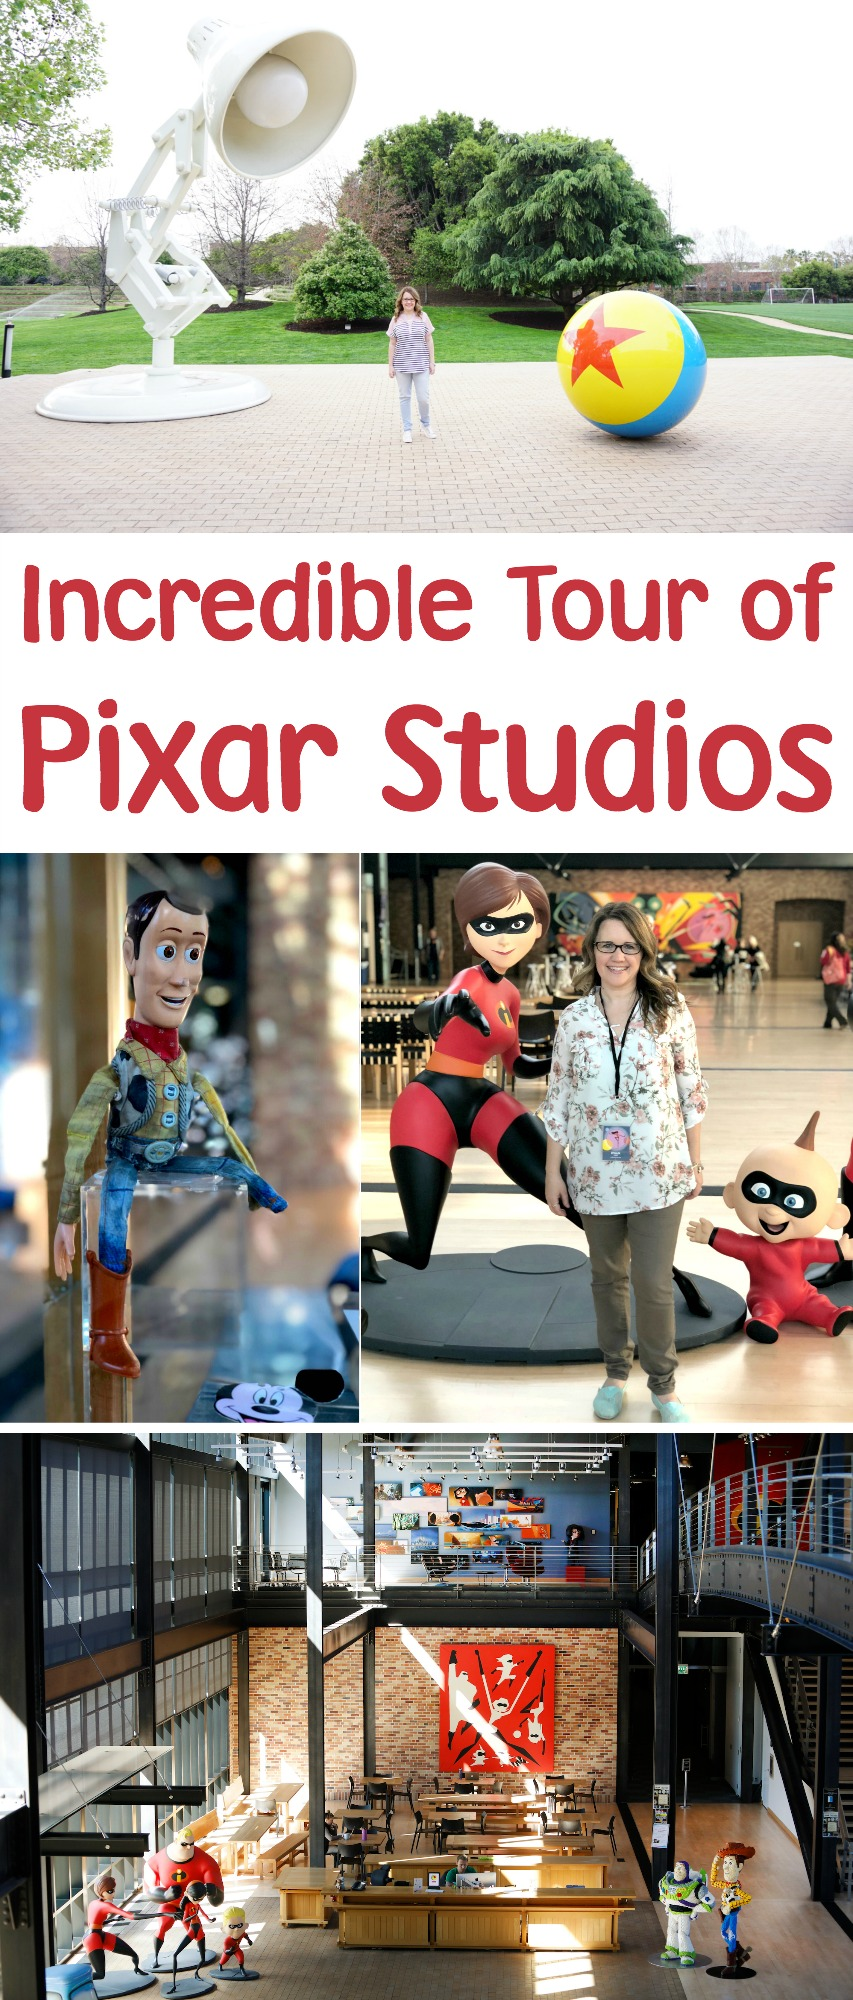 Incredible Tour of Pixar Studios